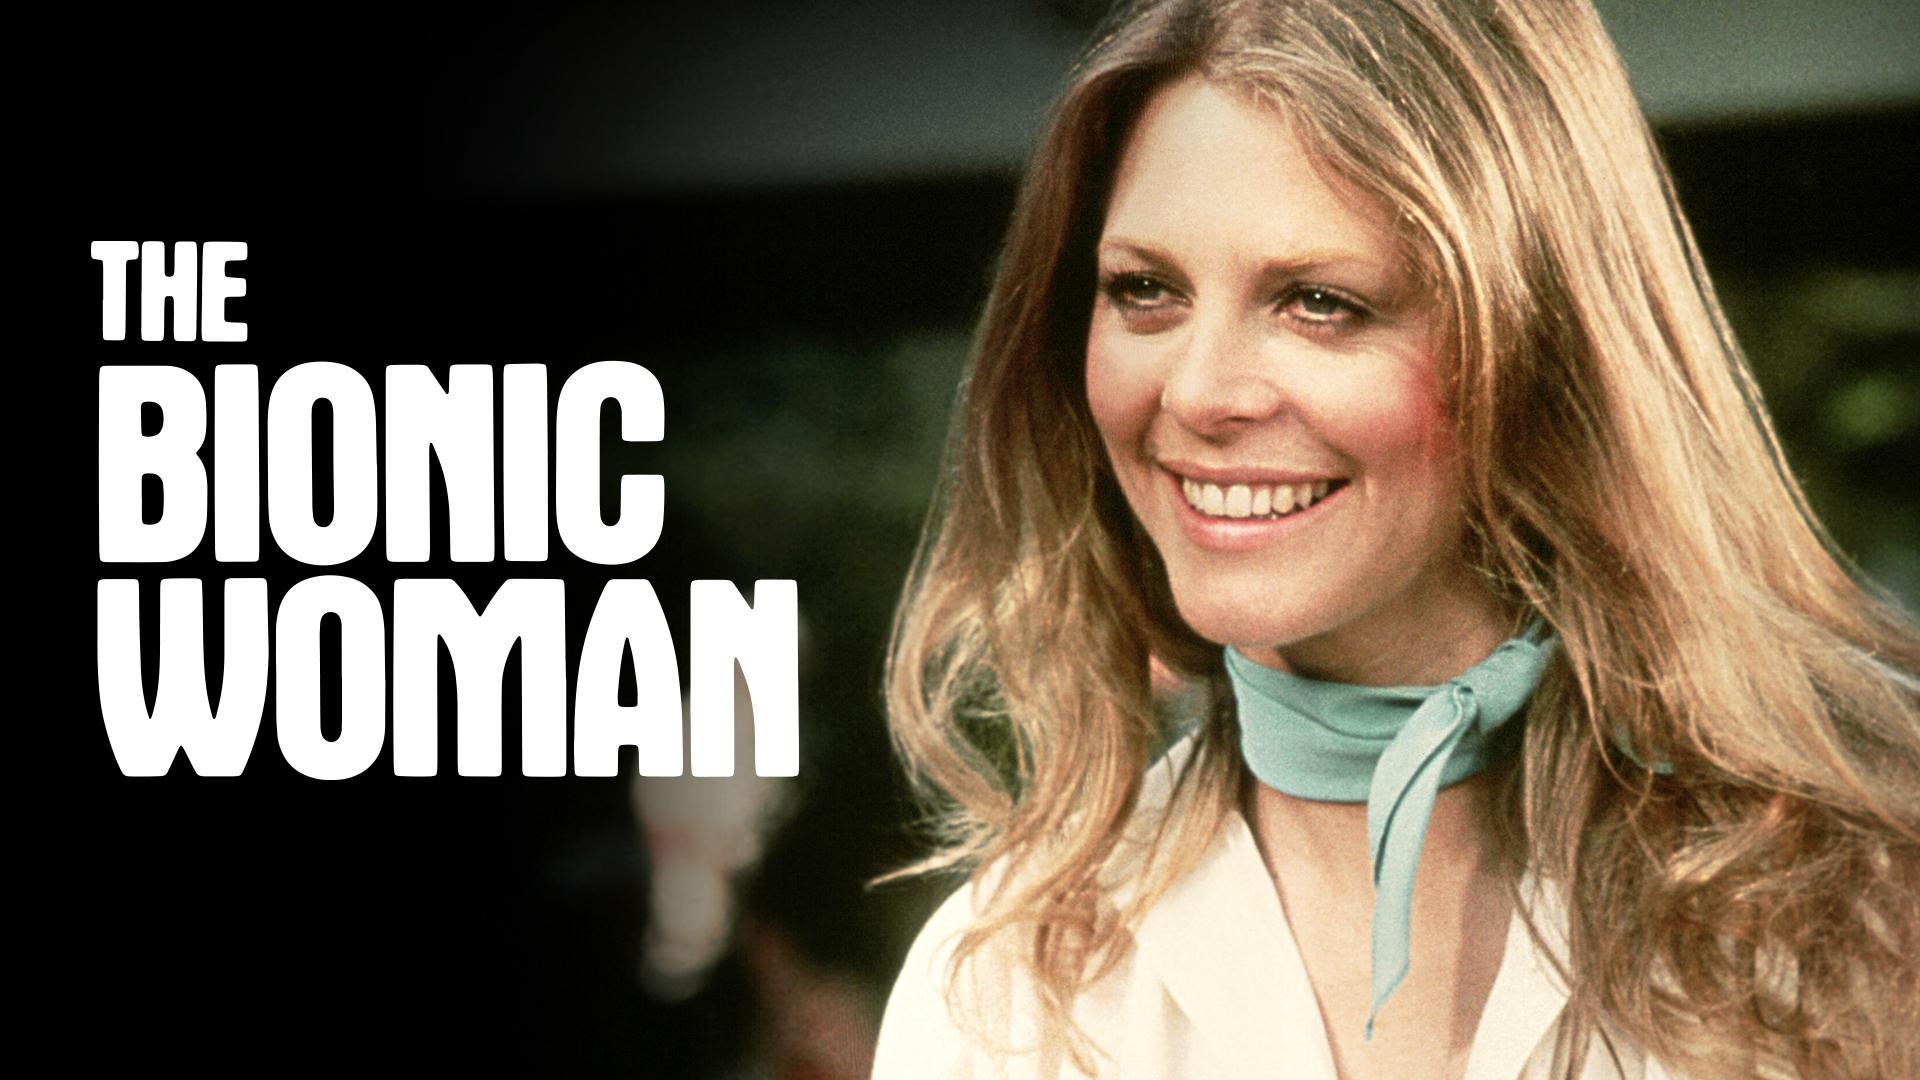 The Bionic Woman Season 2 Episodes at NBC.com